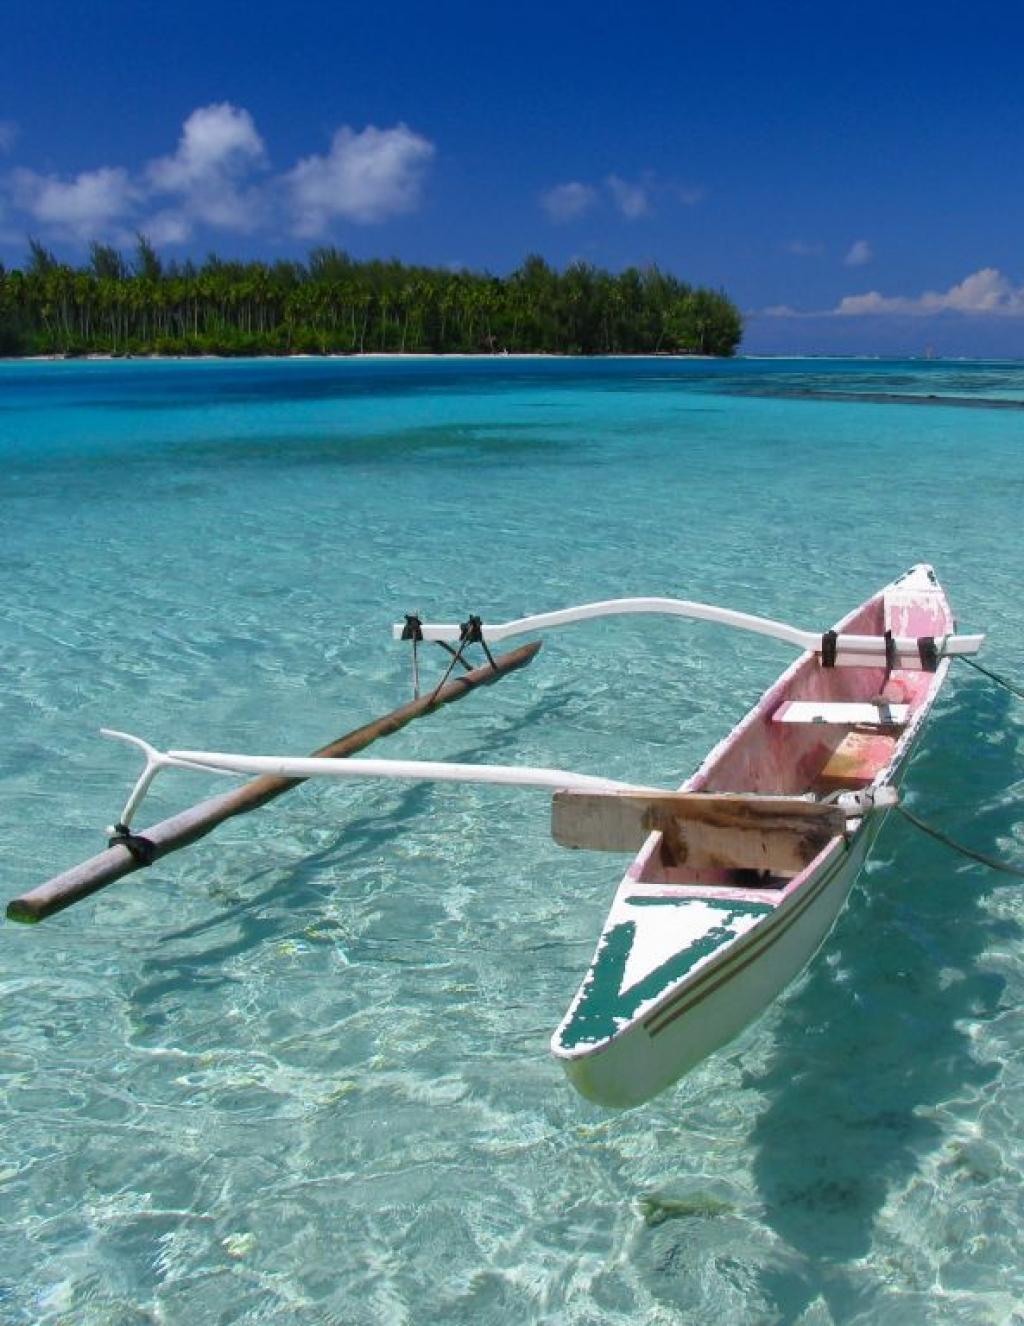 VIAJES A LA POLINESIA DESDE ARGENTINA - Bora Bora / Moorea / Papeete /  - Buteler Viajes